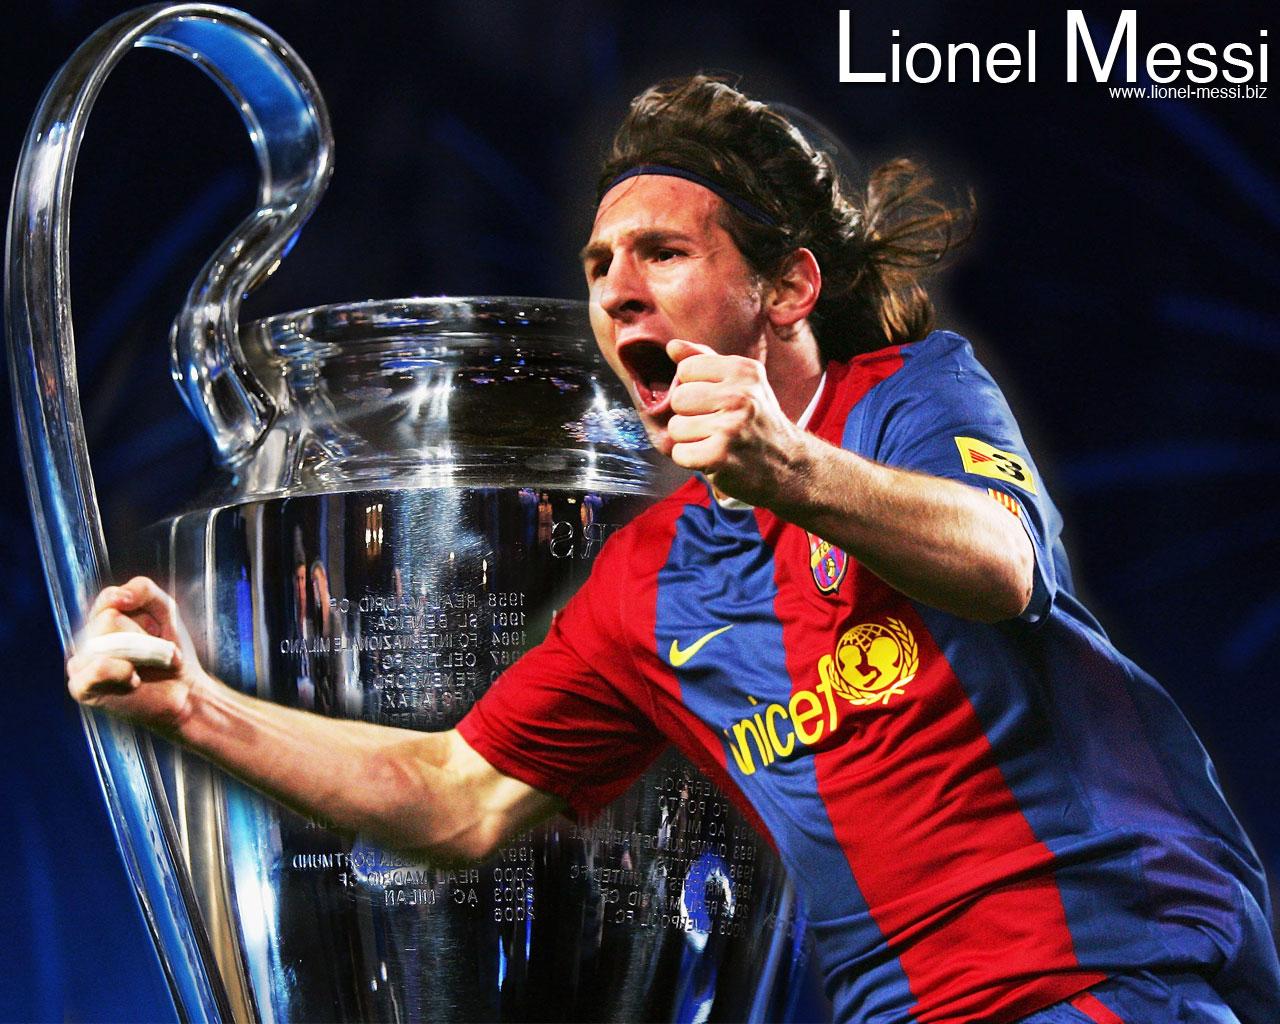 http://3.bp.blogspot.com/__c9qWlUD8Qs/S8yf22Wh9YI/AAAAAAAAGxQ/B3KLtwD1ccs/s1600/champions-league-winner-75.jpg